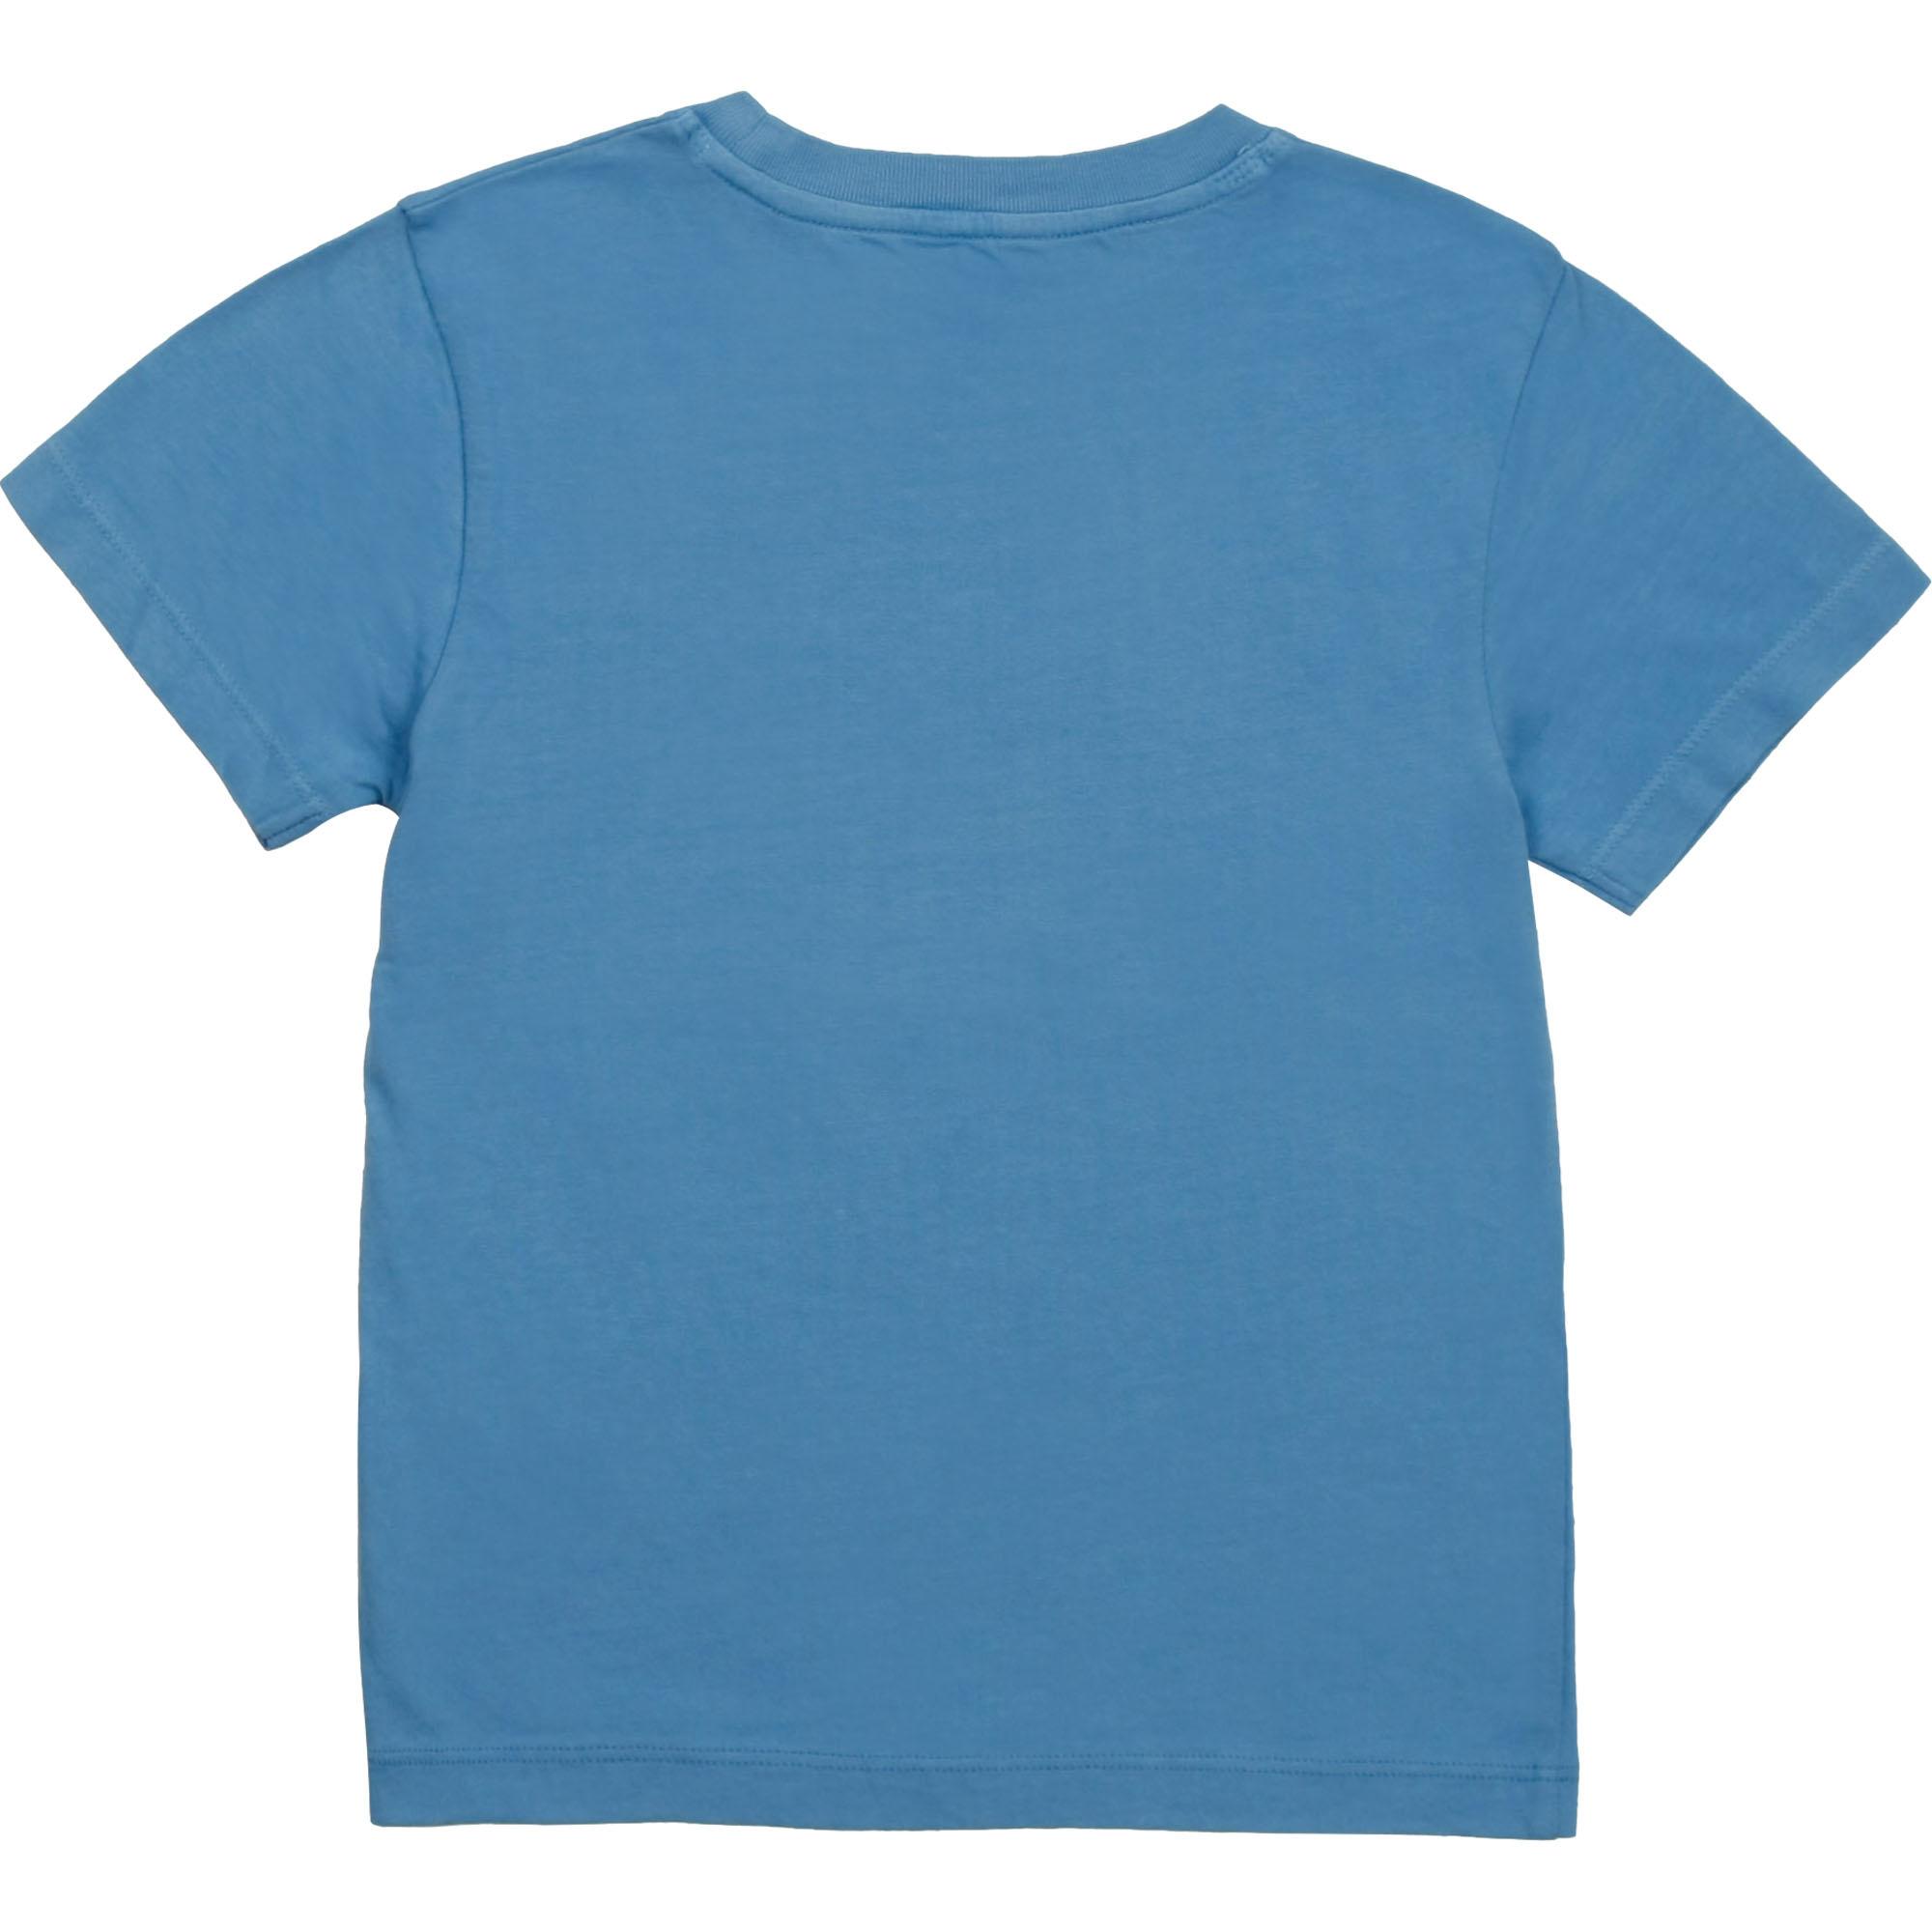 ZADIG & VOLTAIRE t shirt en jersey de coton-2